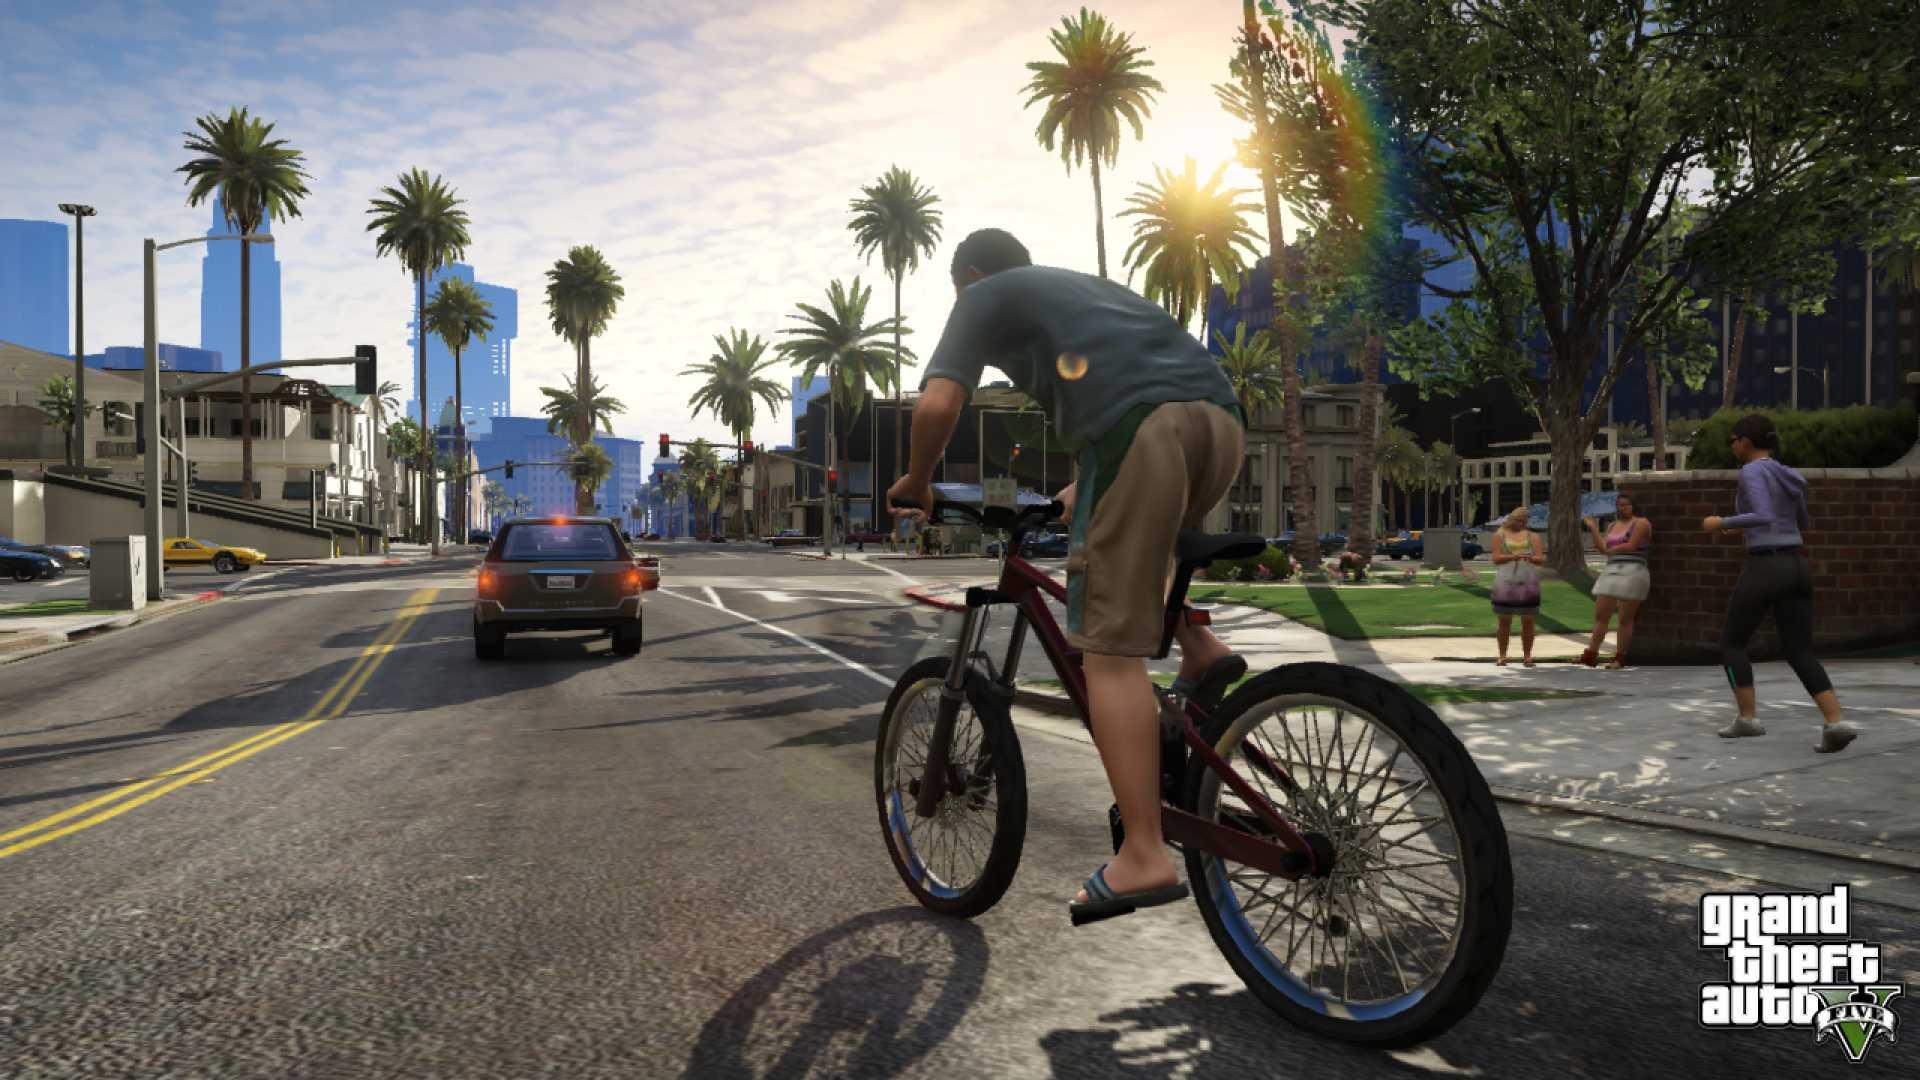 Gta 5 Gameplay Screenshot